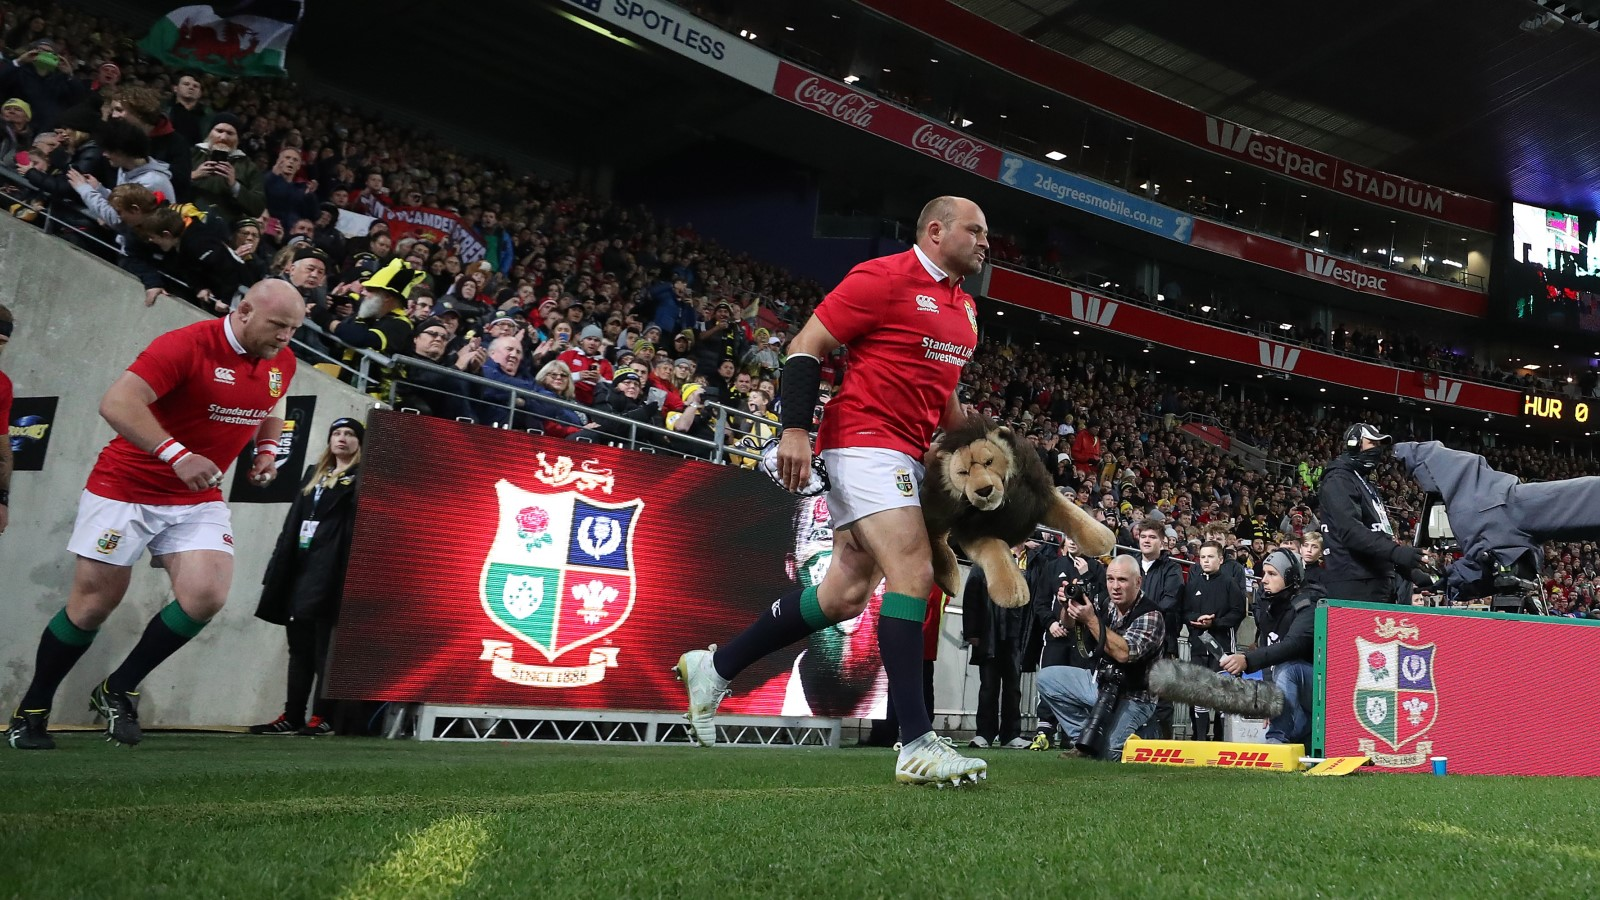 Best bids farewell to Ulster after semi-final defeat